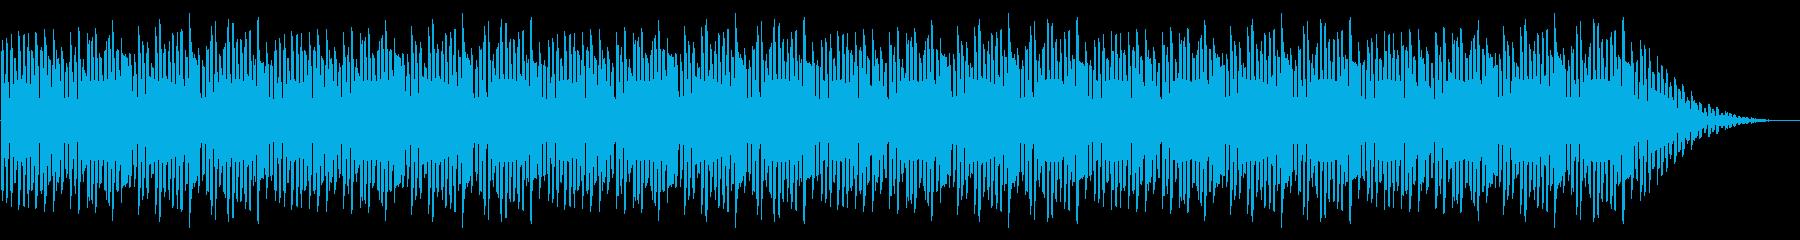 GB系風和風ゲームのタイトル曲の再生済みの波形